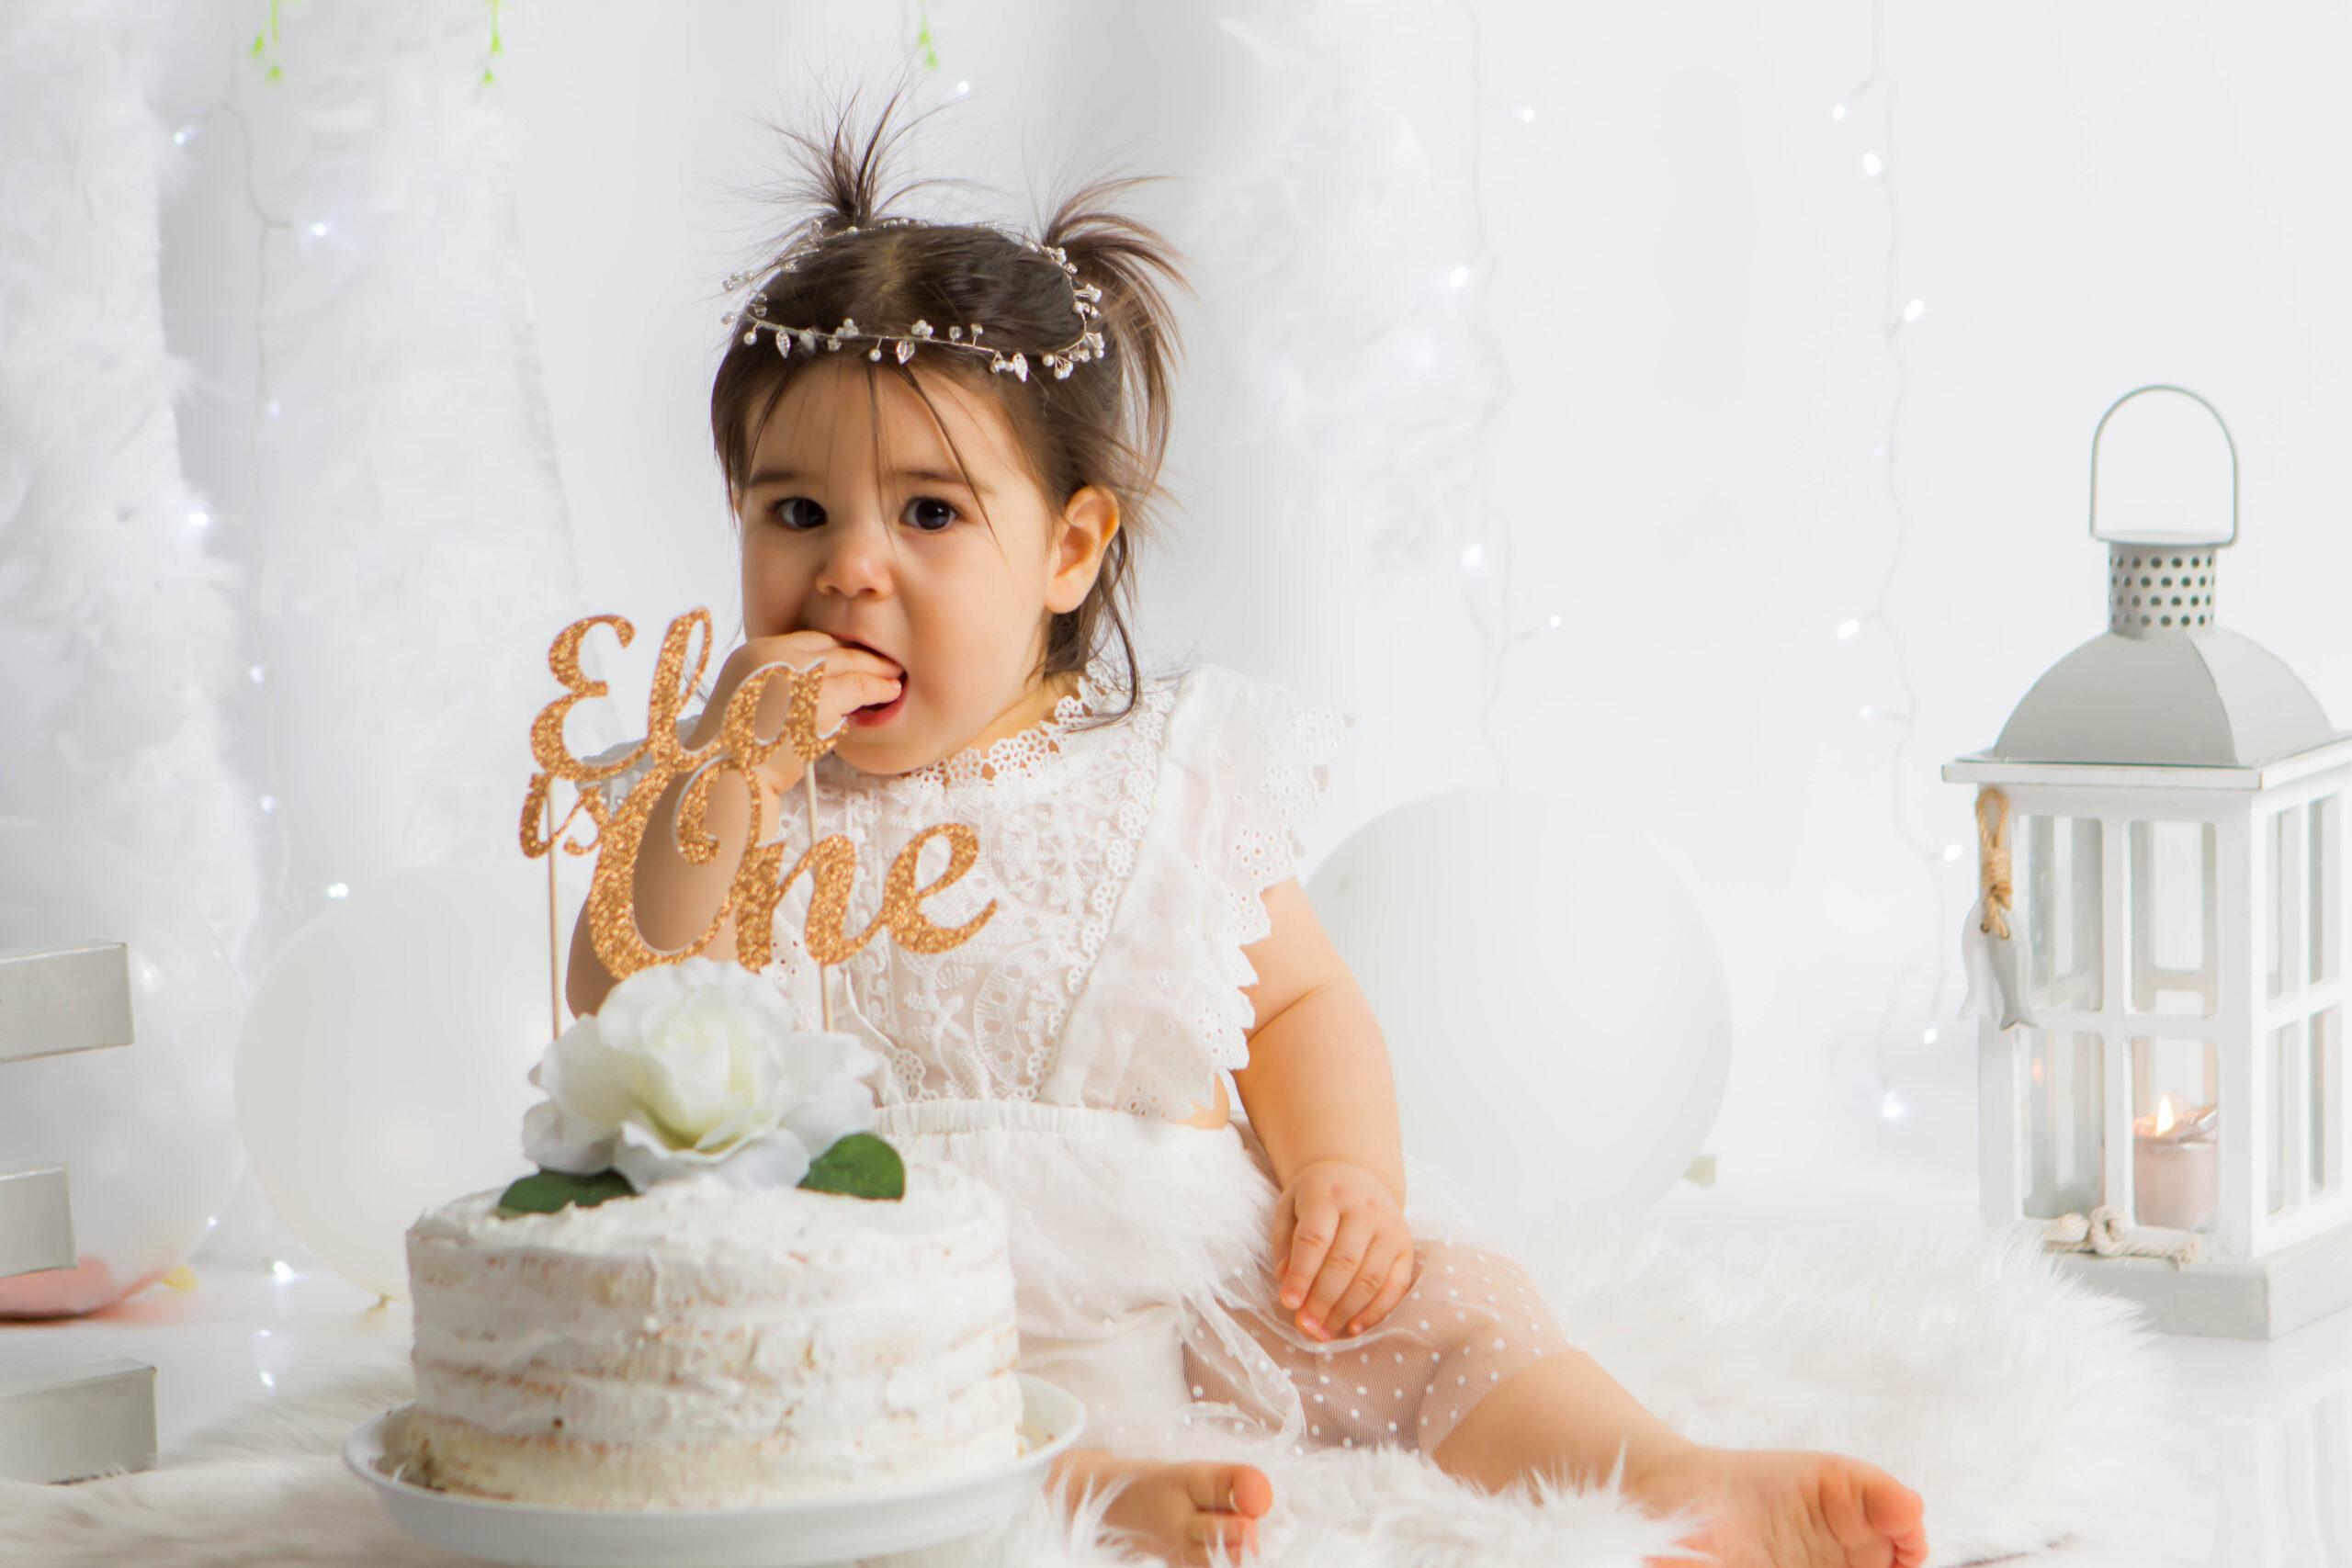 Cake-Smash